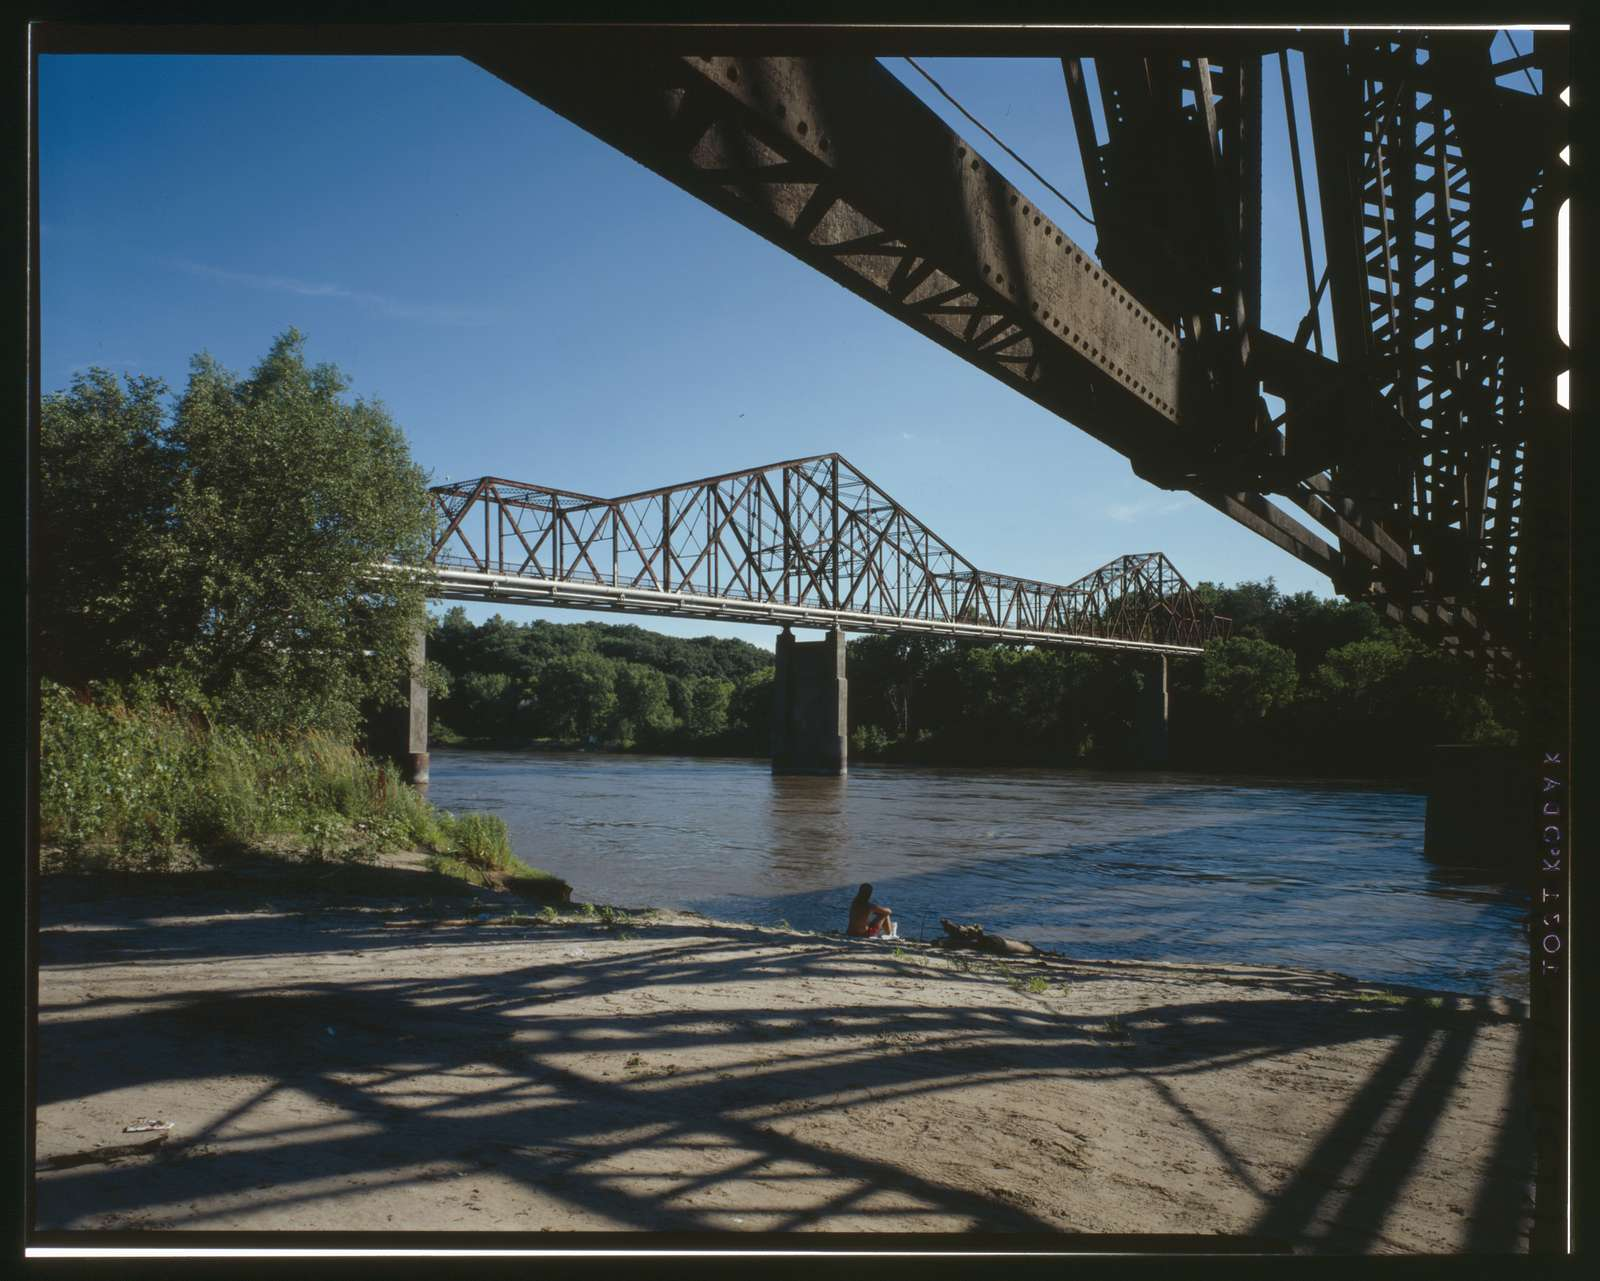 Plattsmouth Bridge, Spanning Missouri River at U.S. Highway 34, Pacific Junction, Mills County, IA